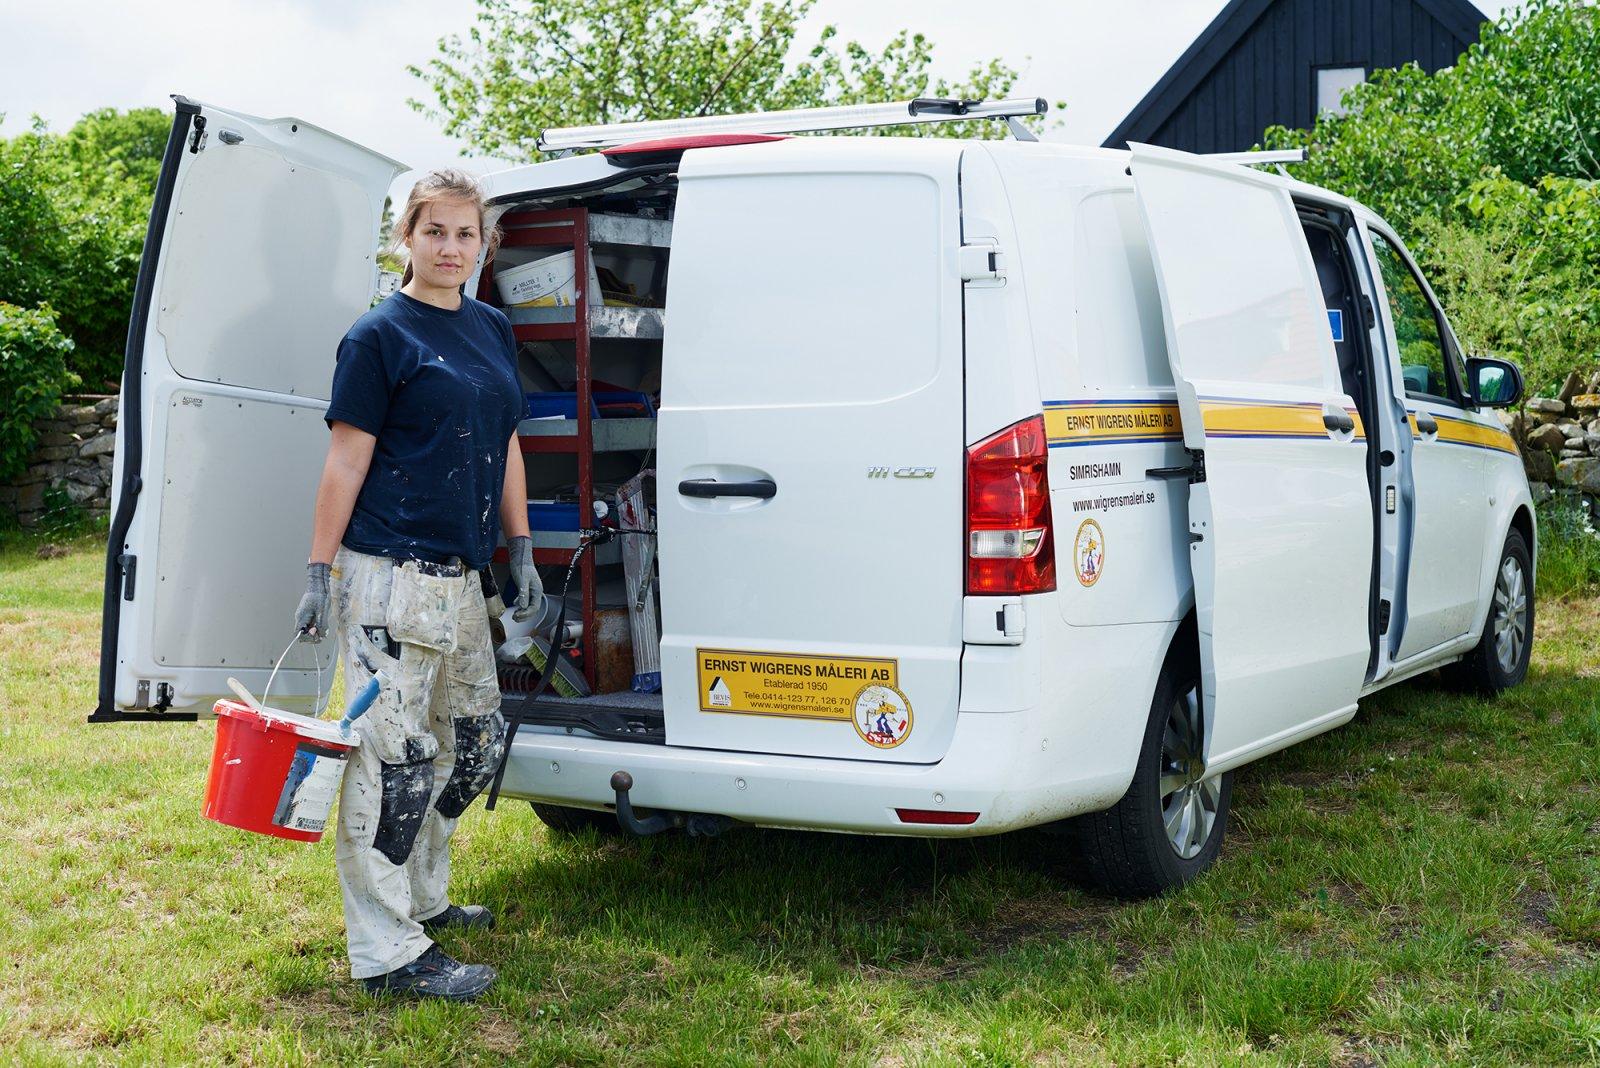 Jennie Ekblad med Ernst Wigren Måleri AB:s Sprinter. Foto: Peter Carlsson